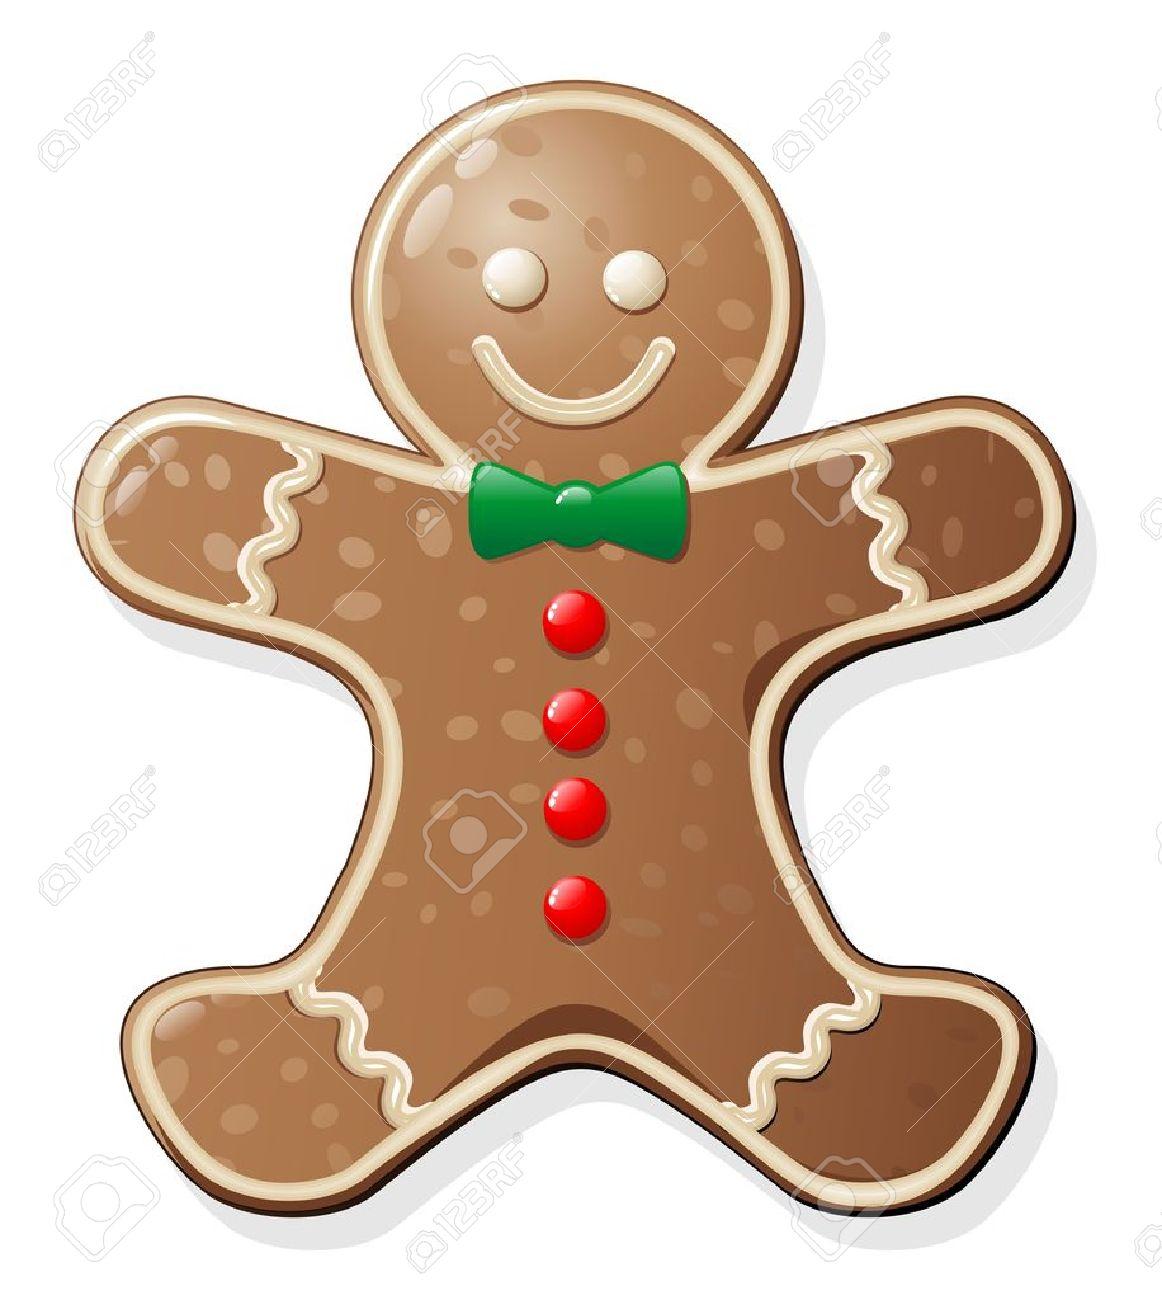 Gingerbread Man Cookie Stock Vector - 10884540